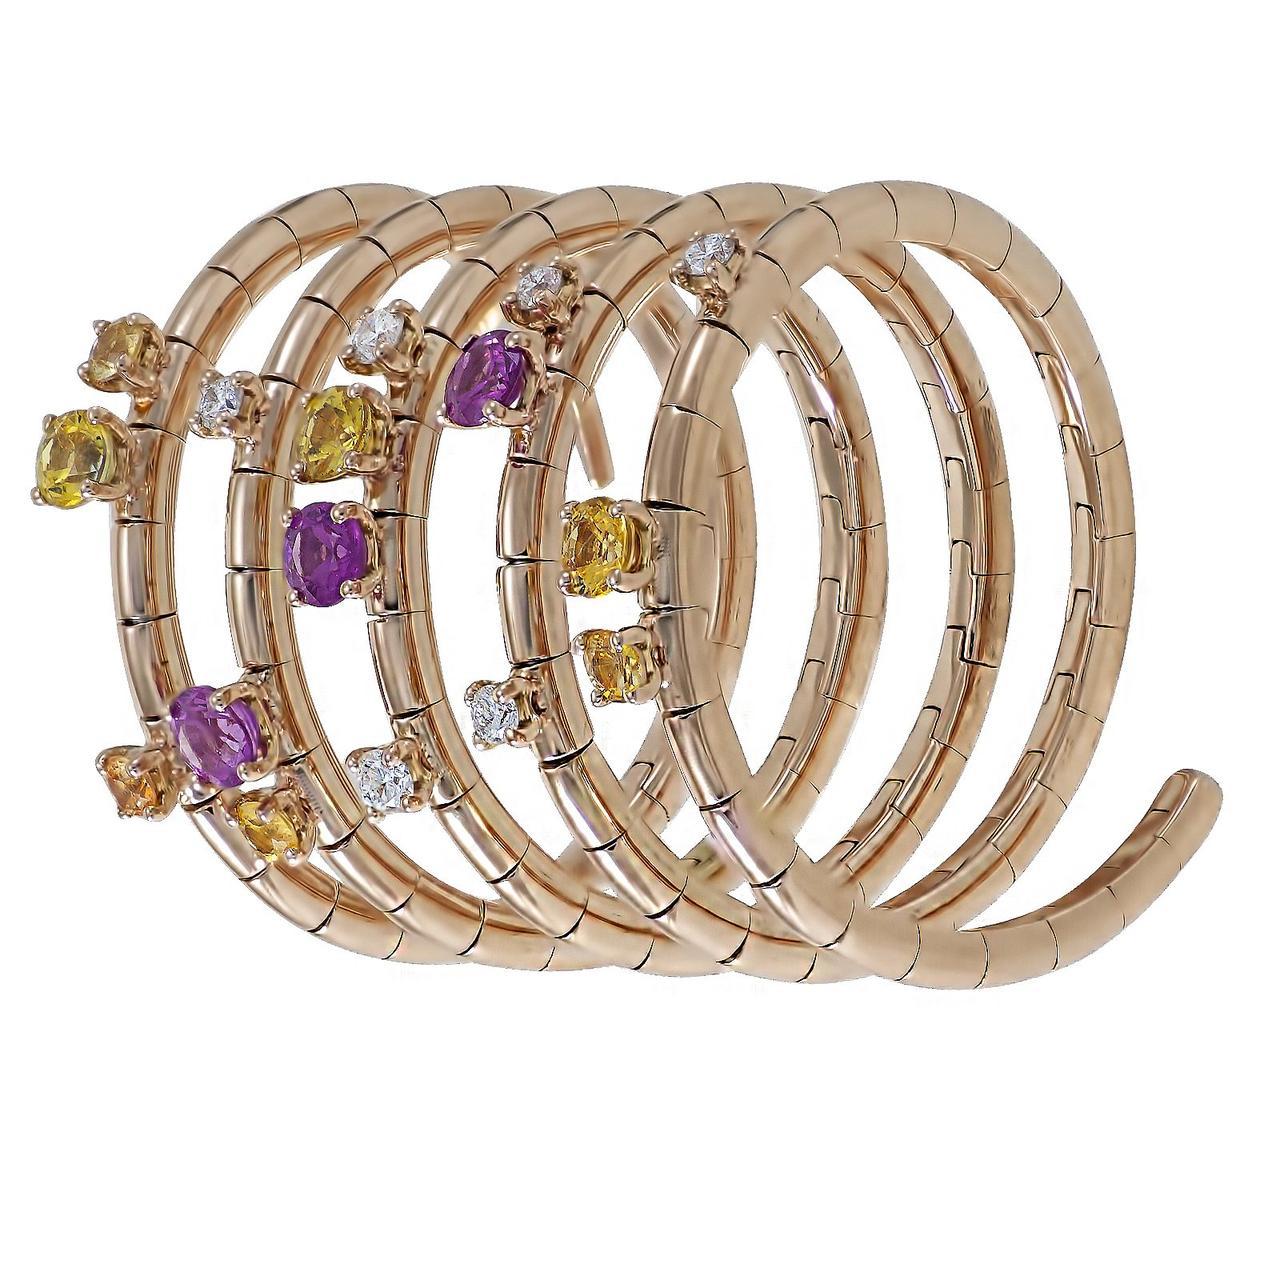 Золотое кольцо с бриллиантами и сапфирами, размер 17 (1723982)